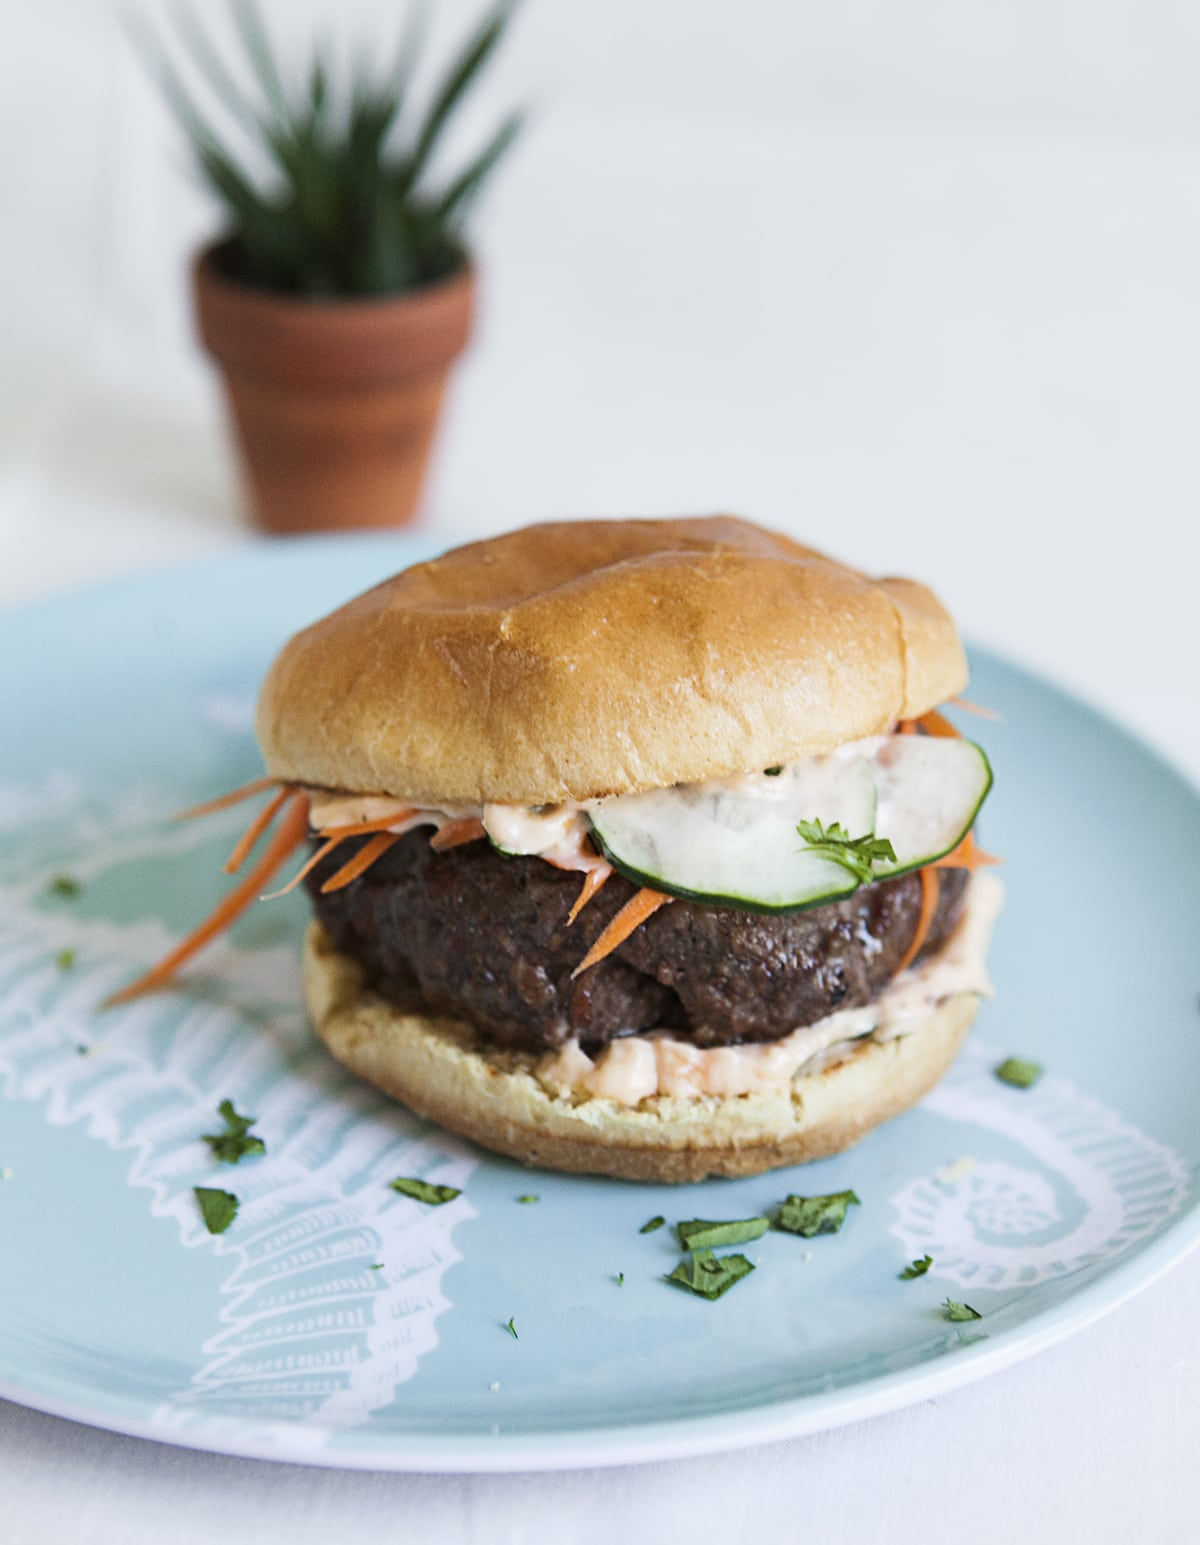 Banh Mi Burgers - Jessica Brigham Blog - Magazine Ready For Life For Less